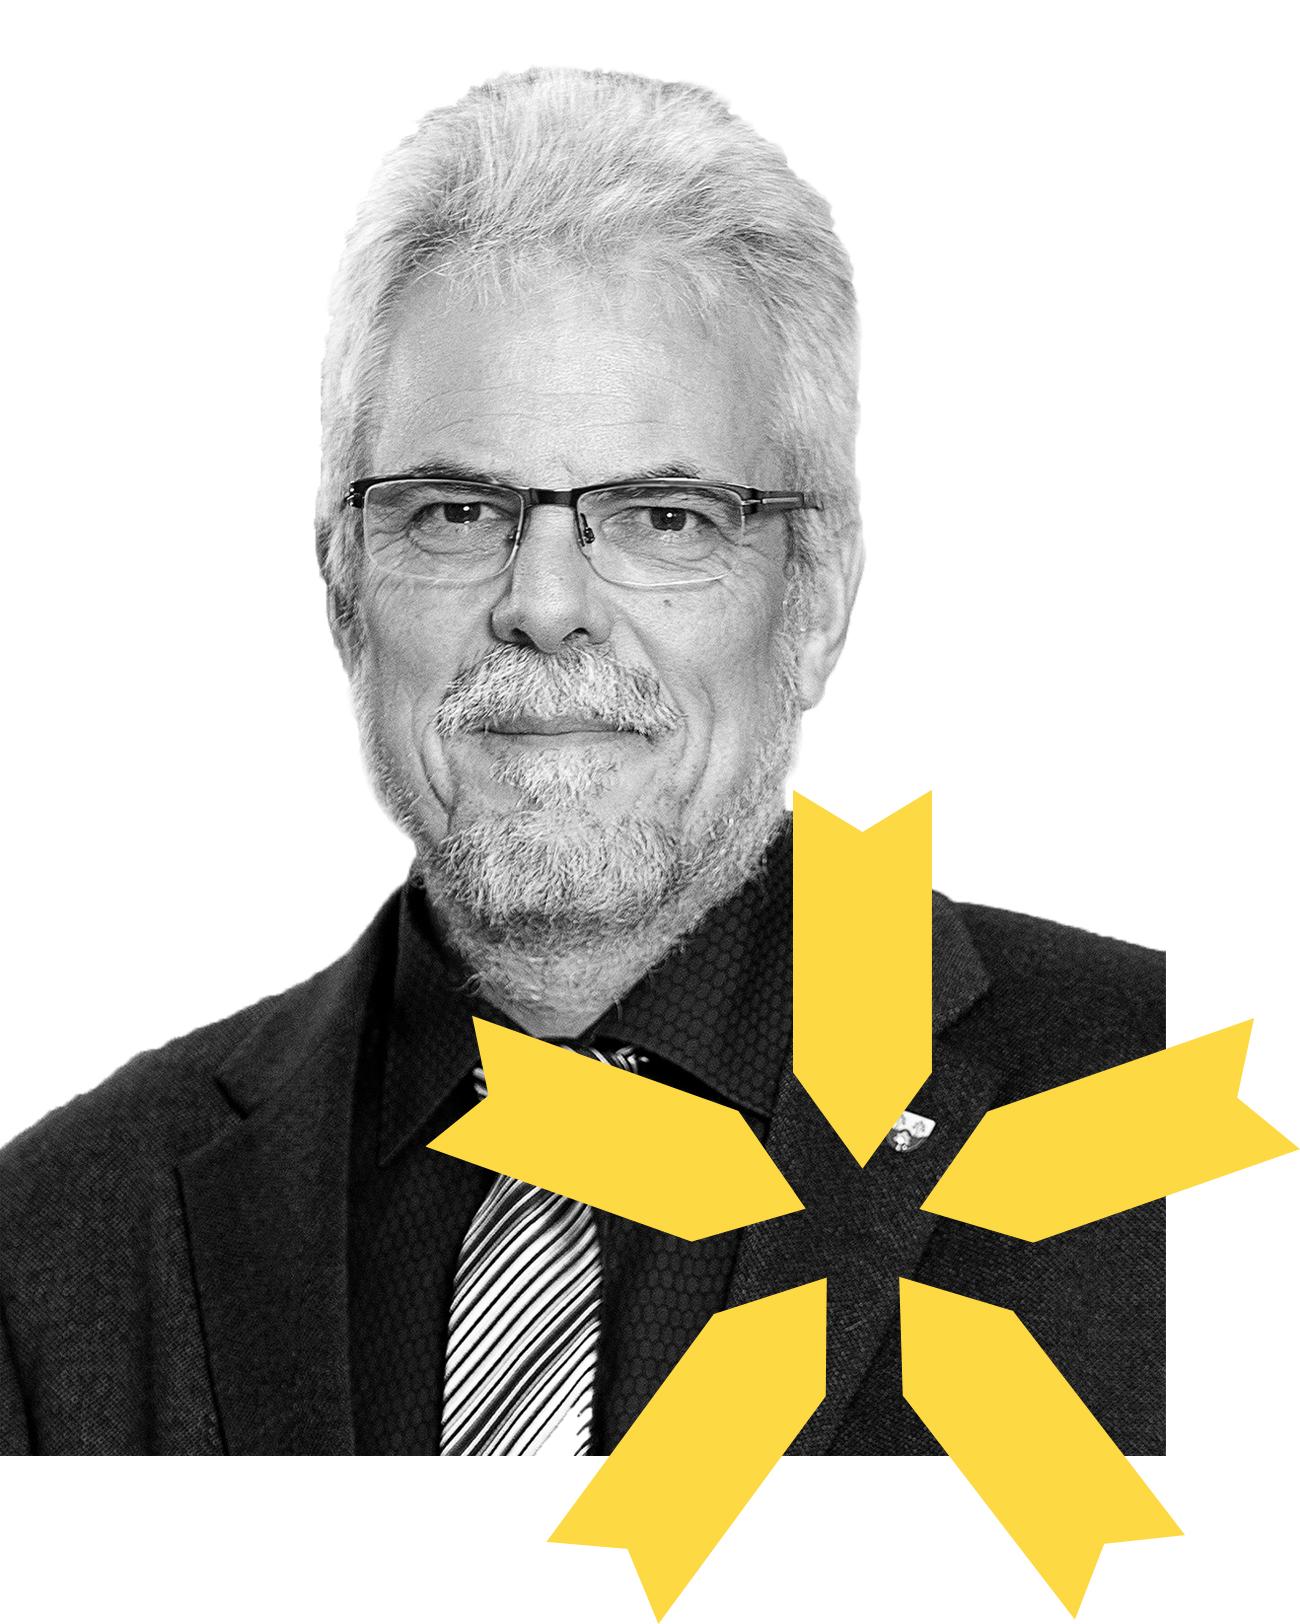 Bestyrelsesformand, Ole Stavad